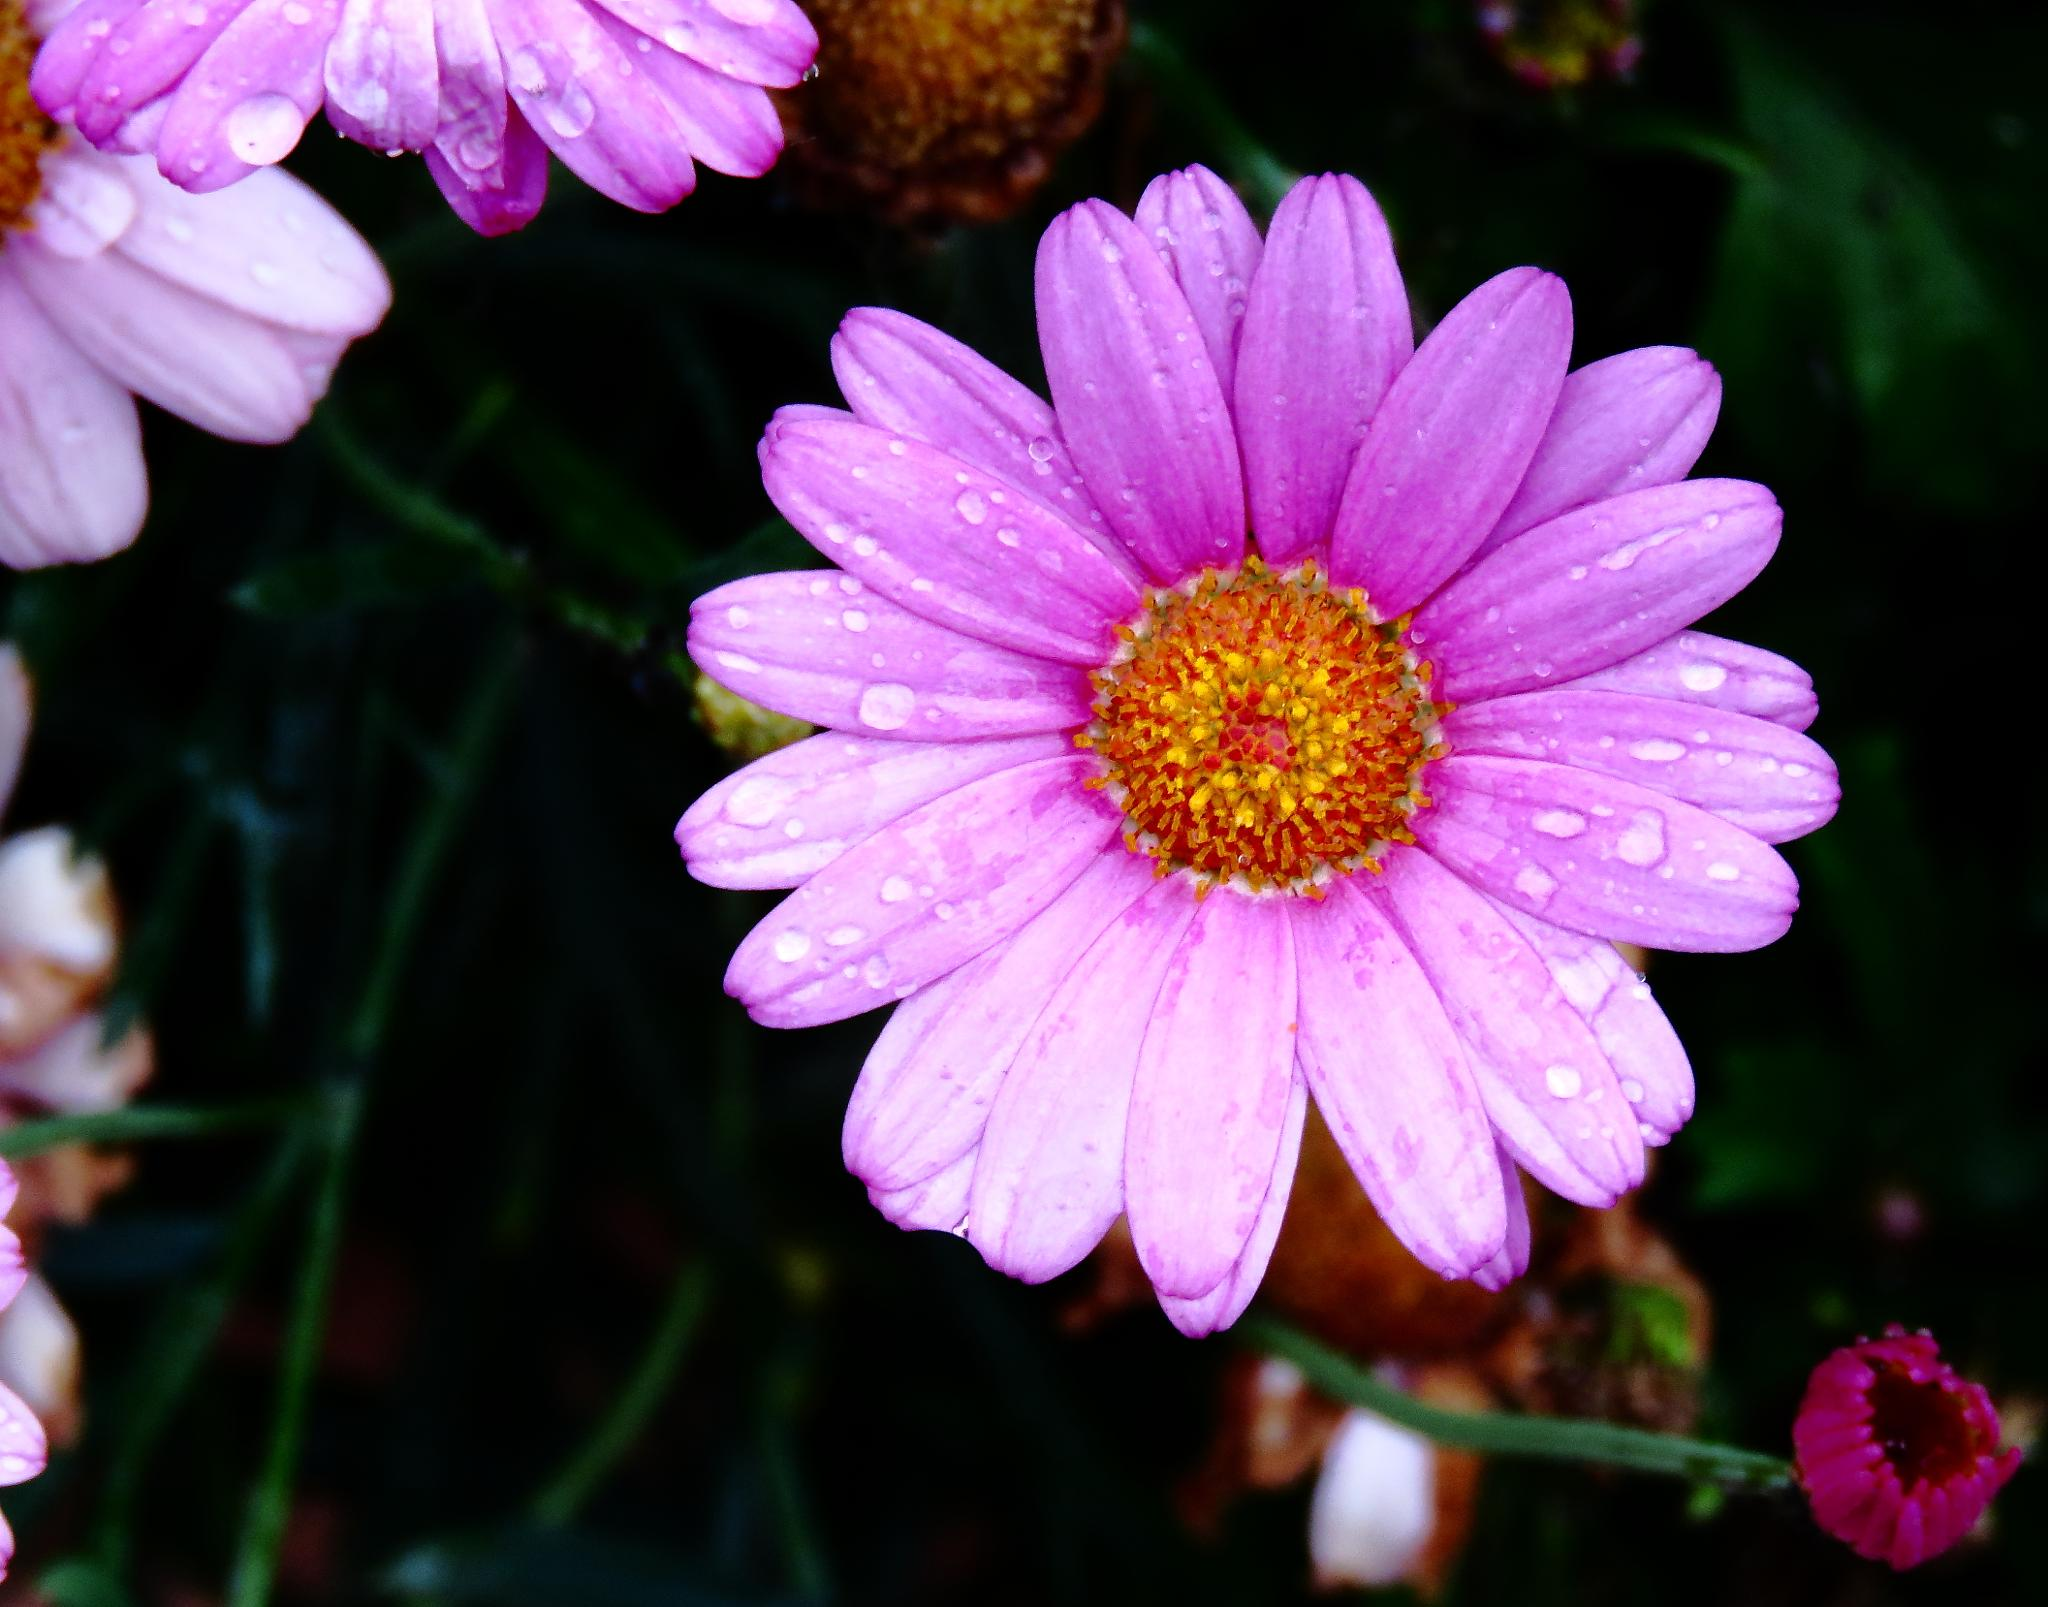 Flower by Henrik Printz